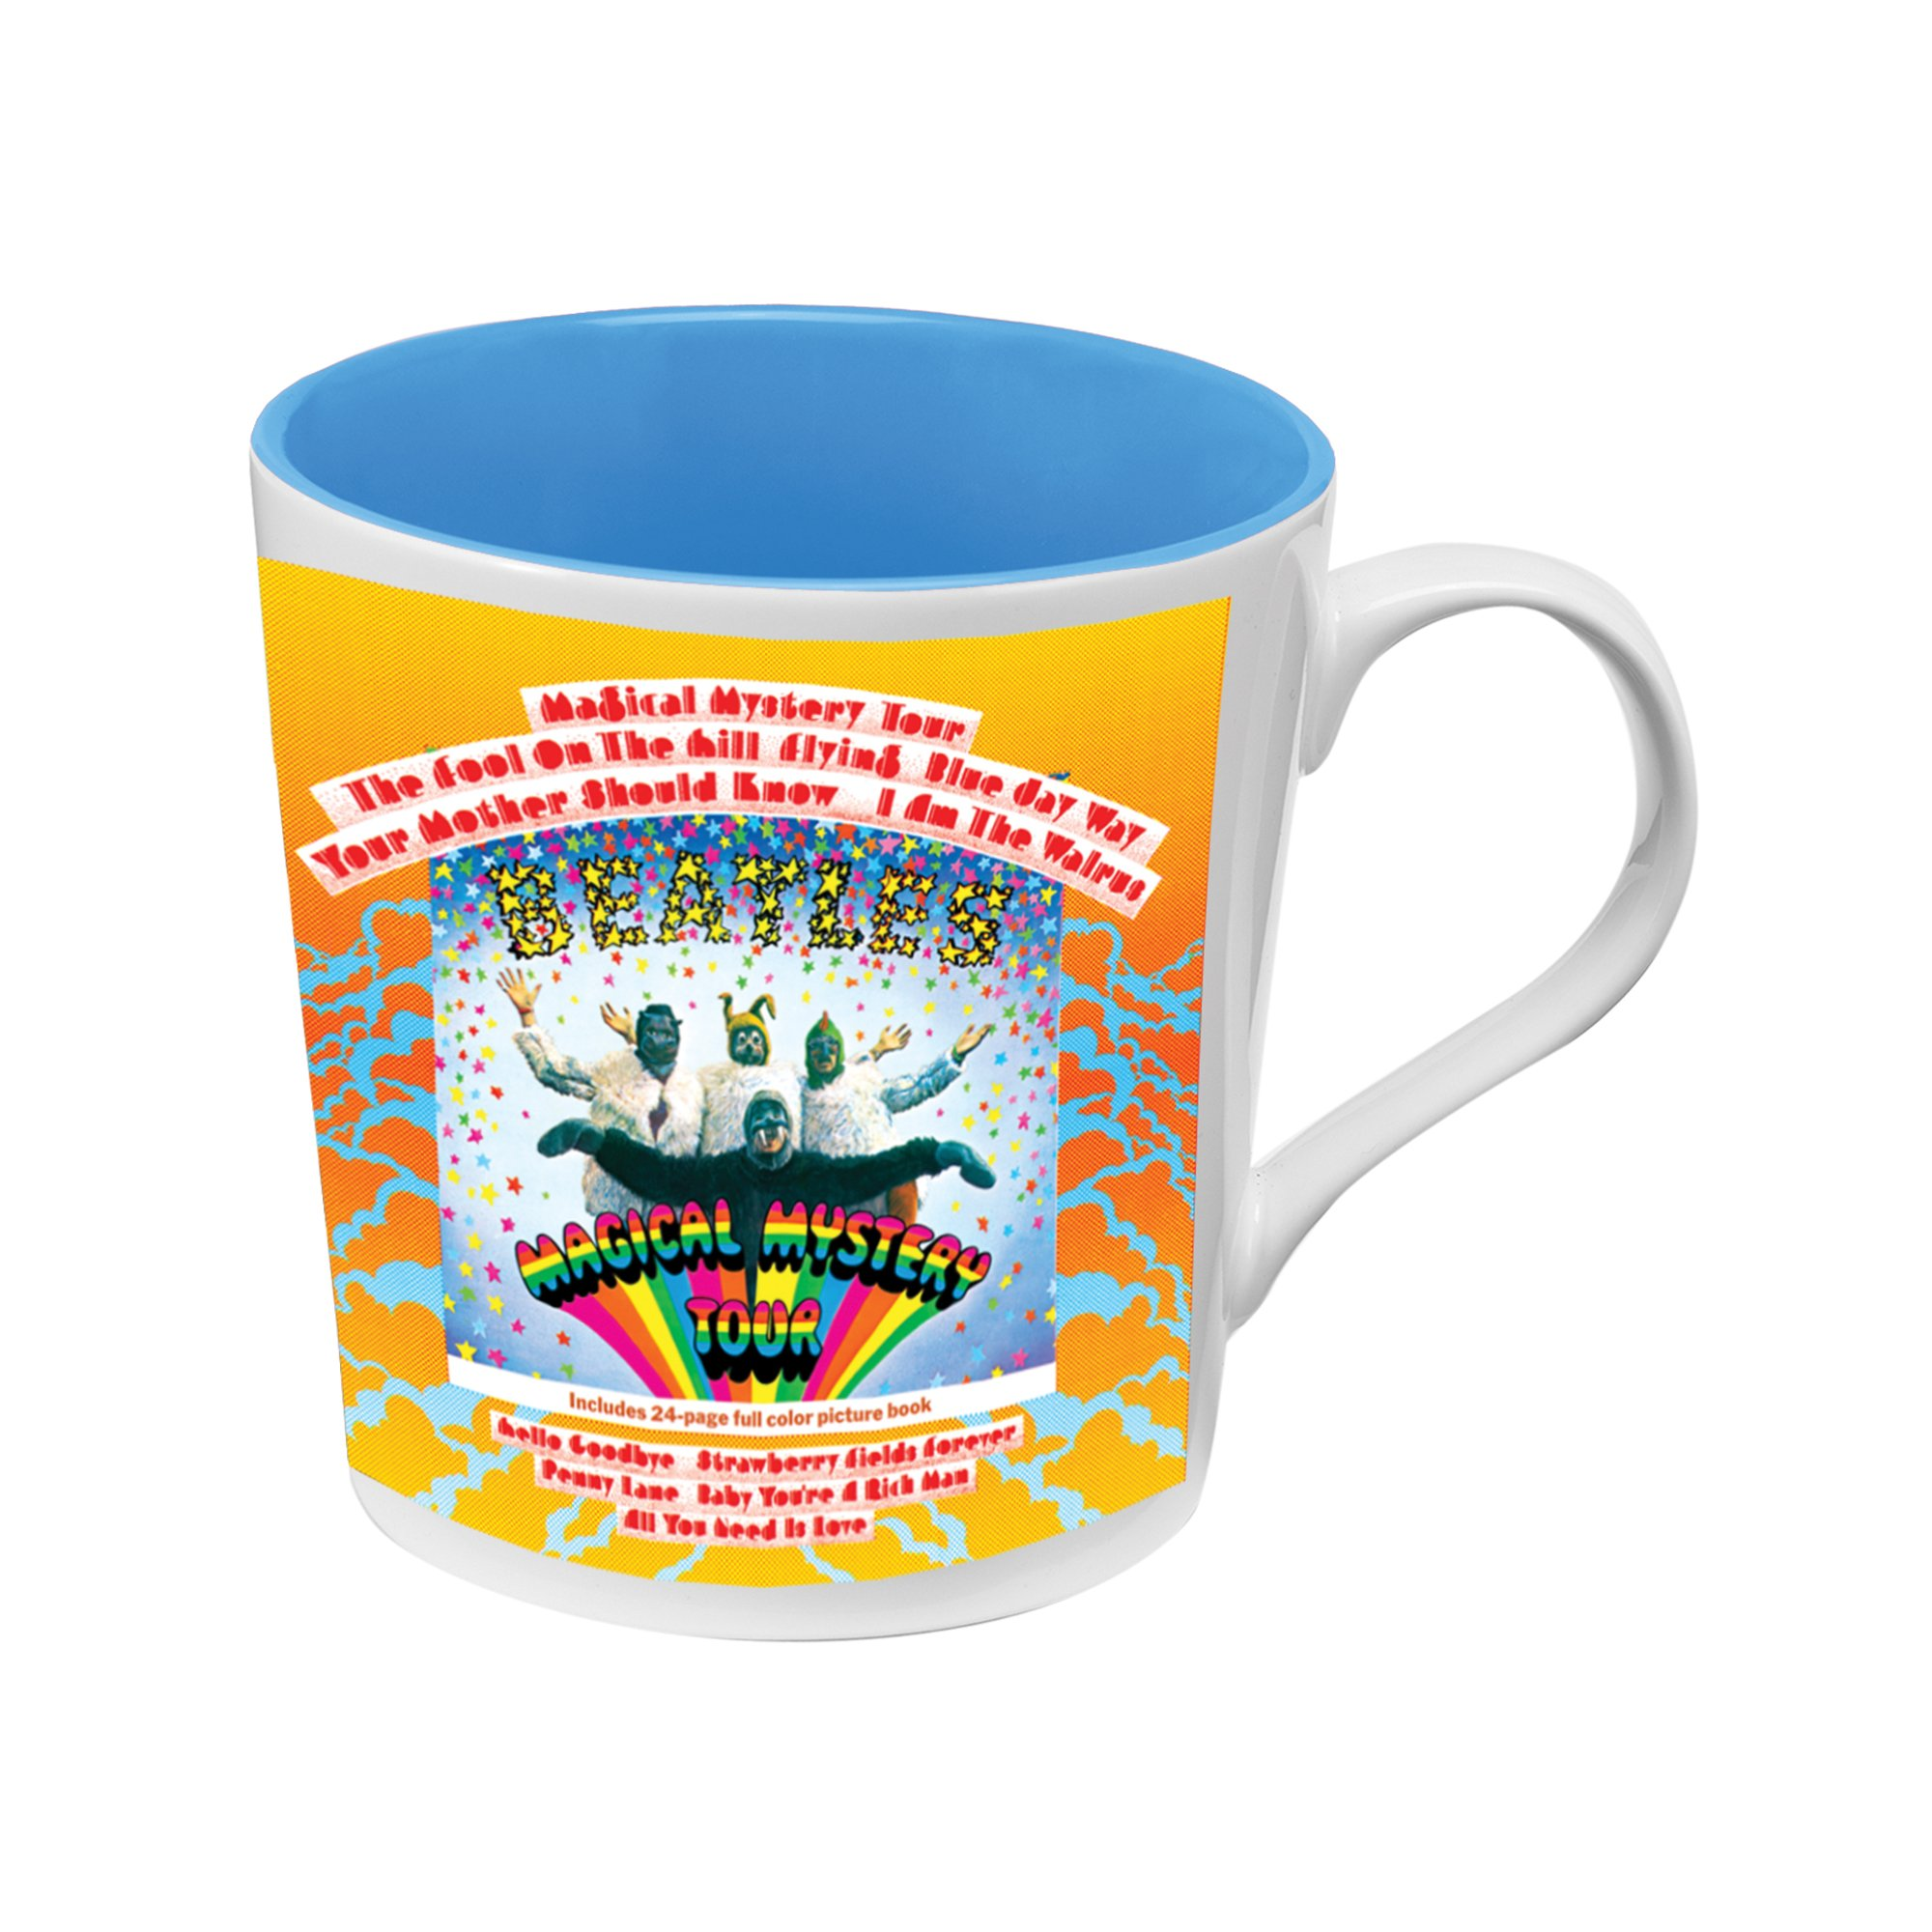 12 oz. Magical Mystery Tour Mug